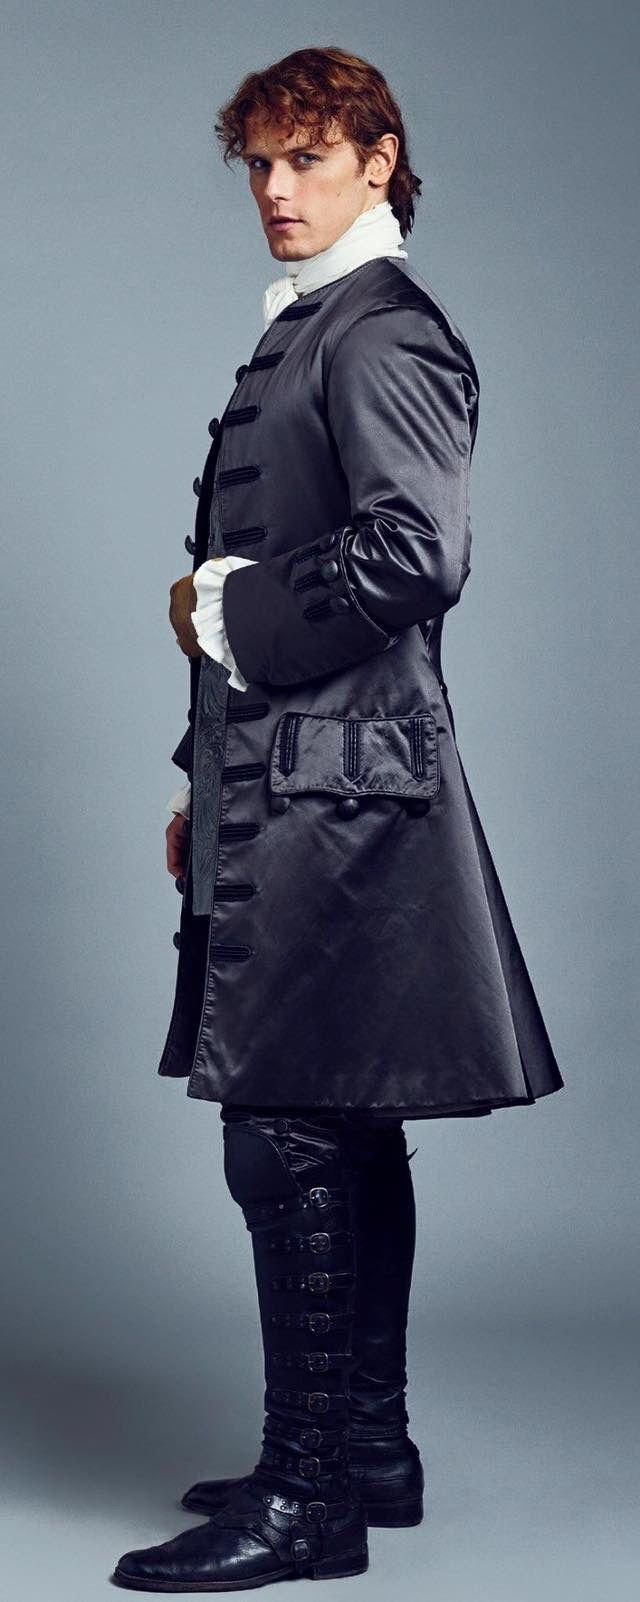 Jamie Fraser, looking stunningly handsome in elegant Parisian attire!    . . . https://todaynewsshow.com/outlander-season-2-extended-cast-promotional-photos/